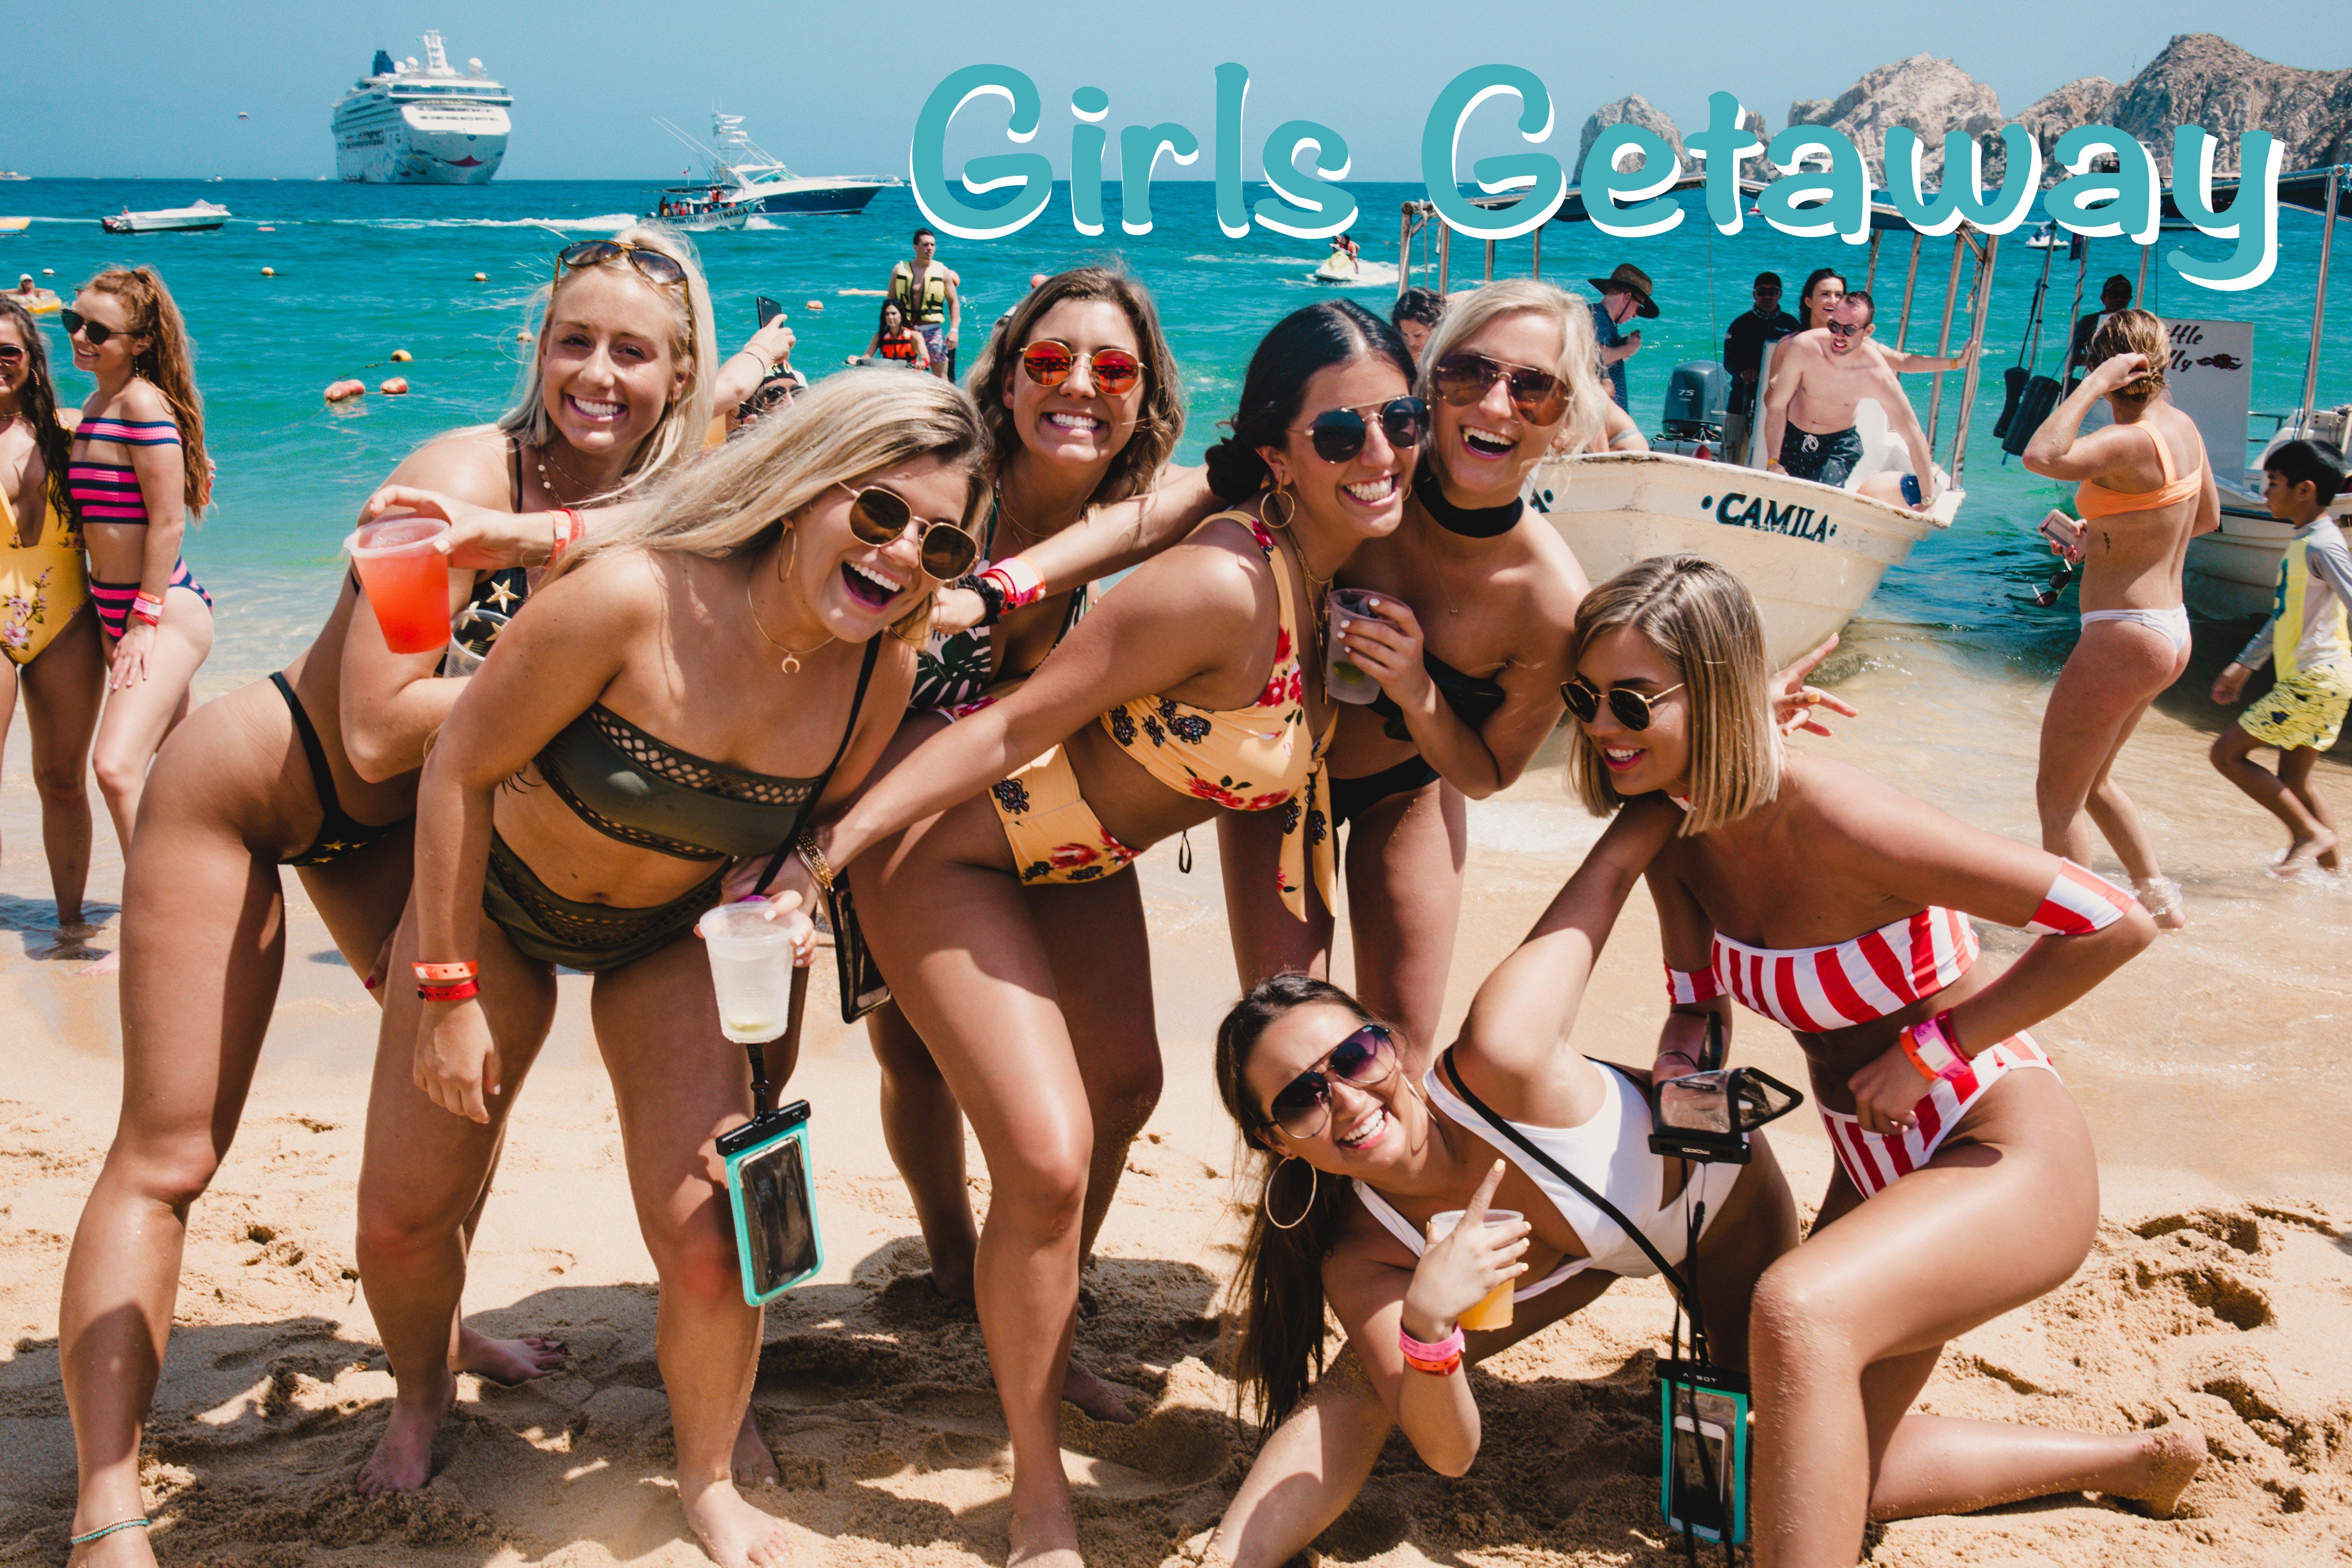 Girls Getaway – Go Blue Tours